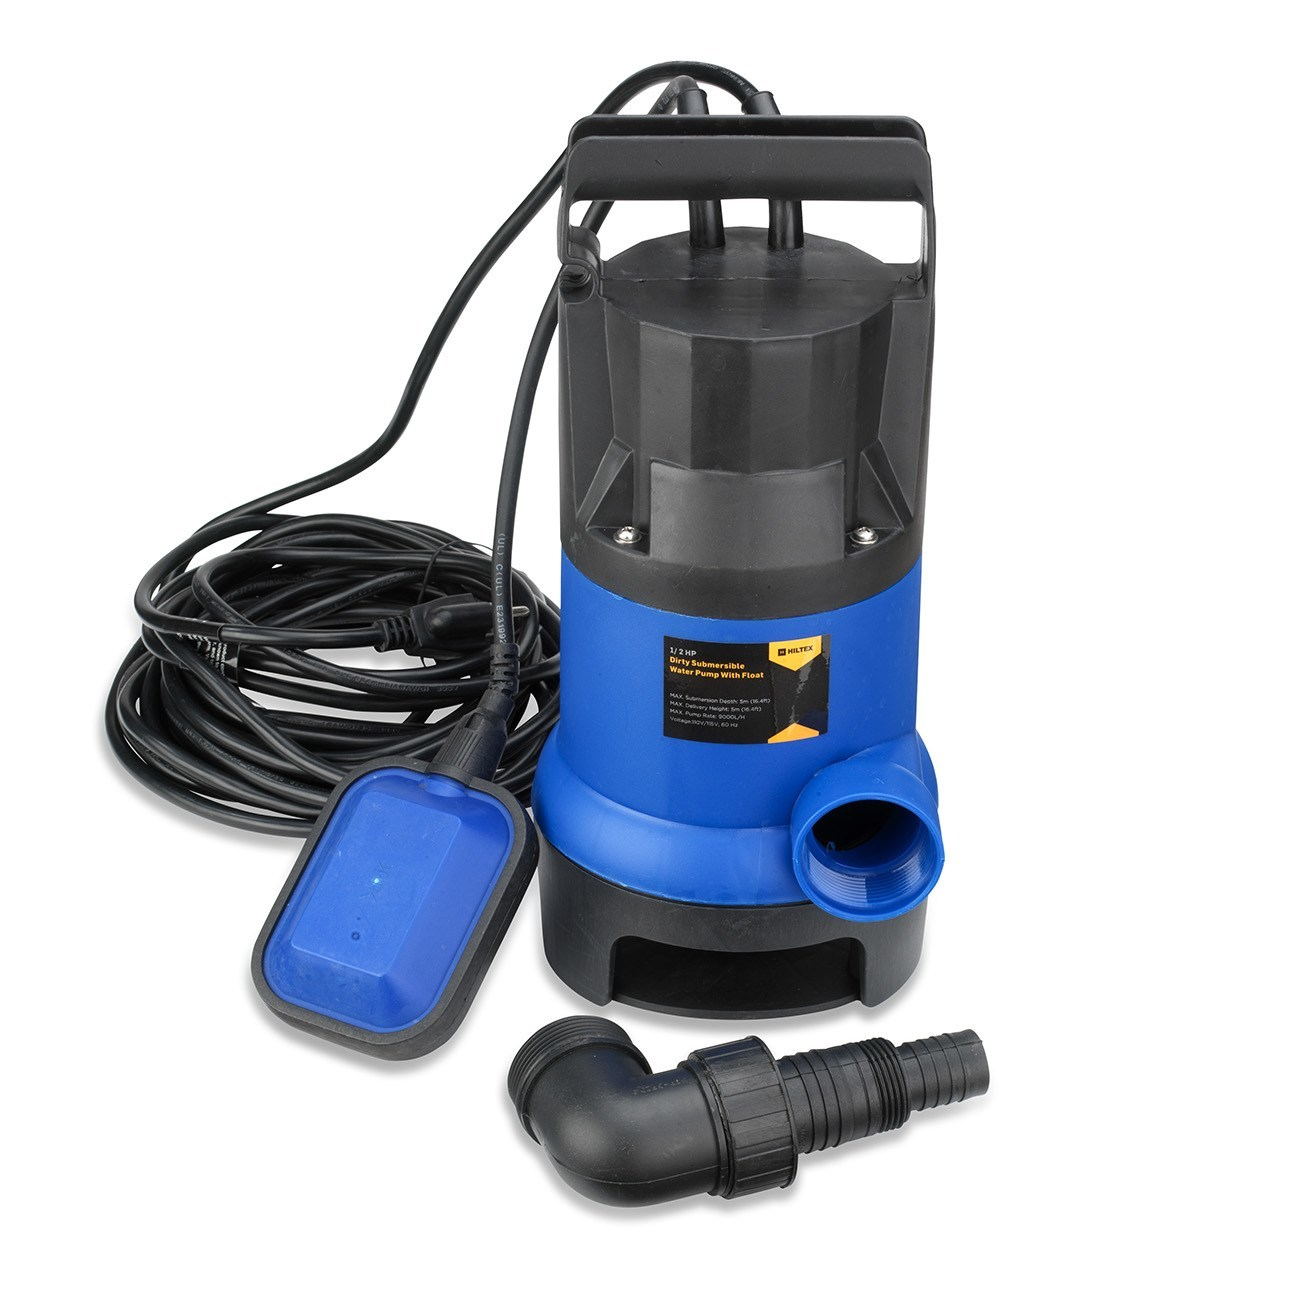 Submersible Water Pump 1 2 Hp 2000gph Clean Clear Dirty Pool Pond Flood Drain Ebay